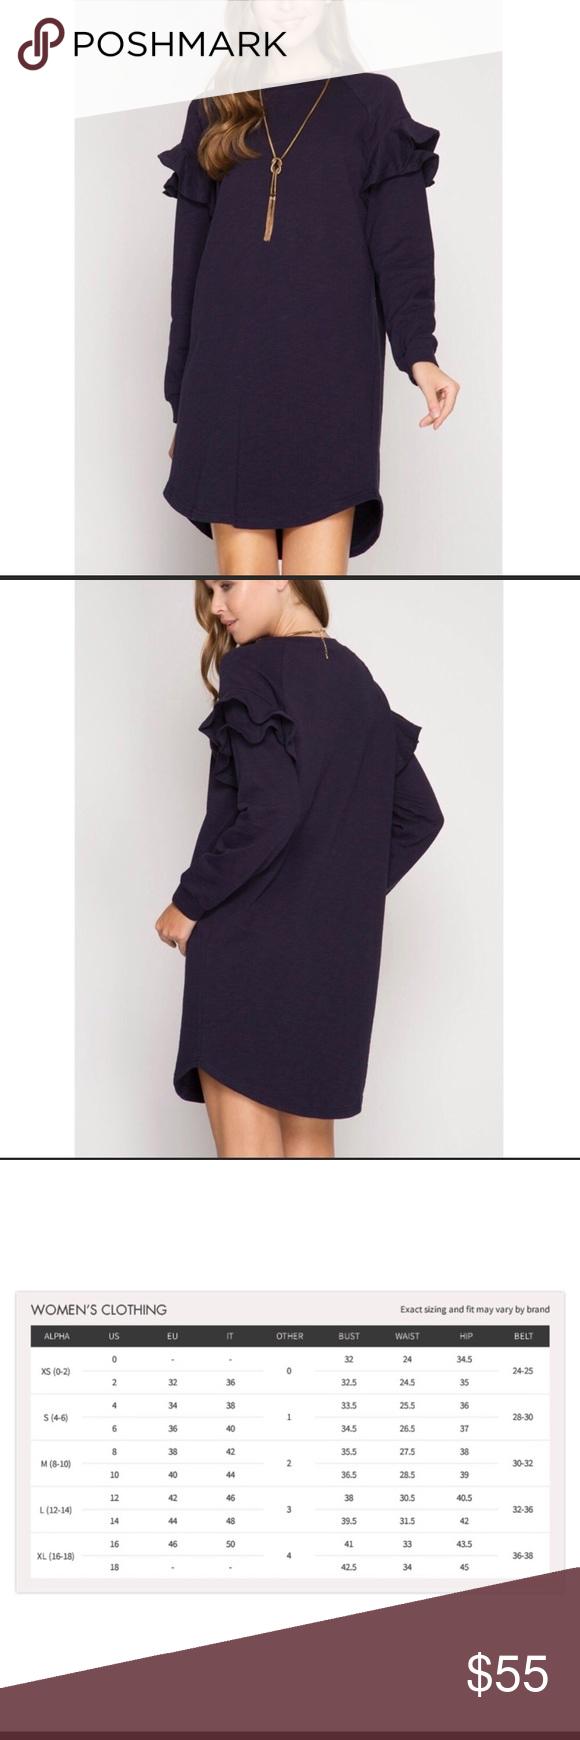 We salelong sleeve dress wruffle shoulder boutique my posh